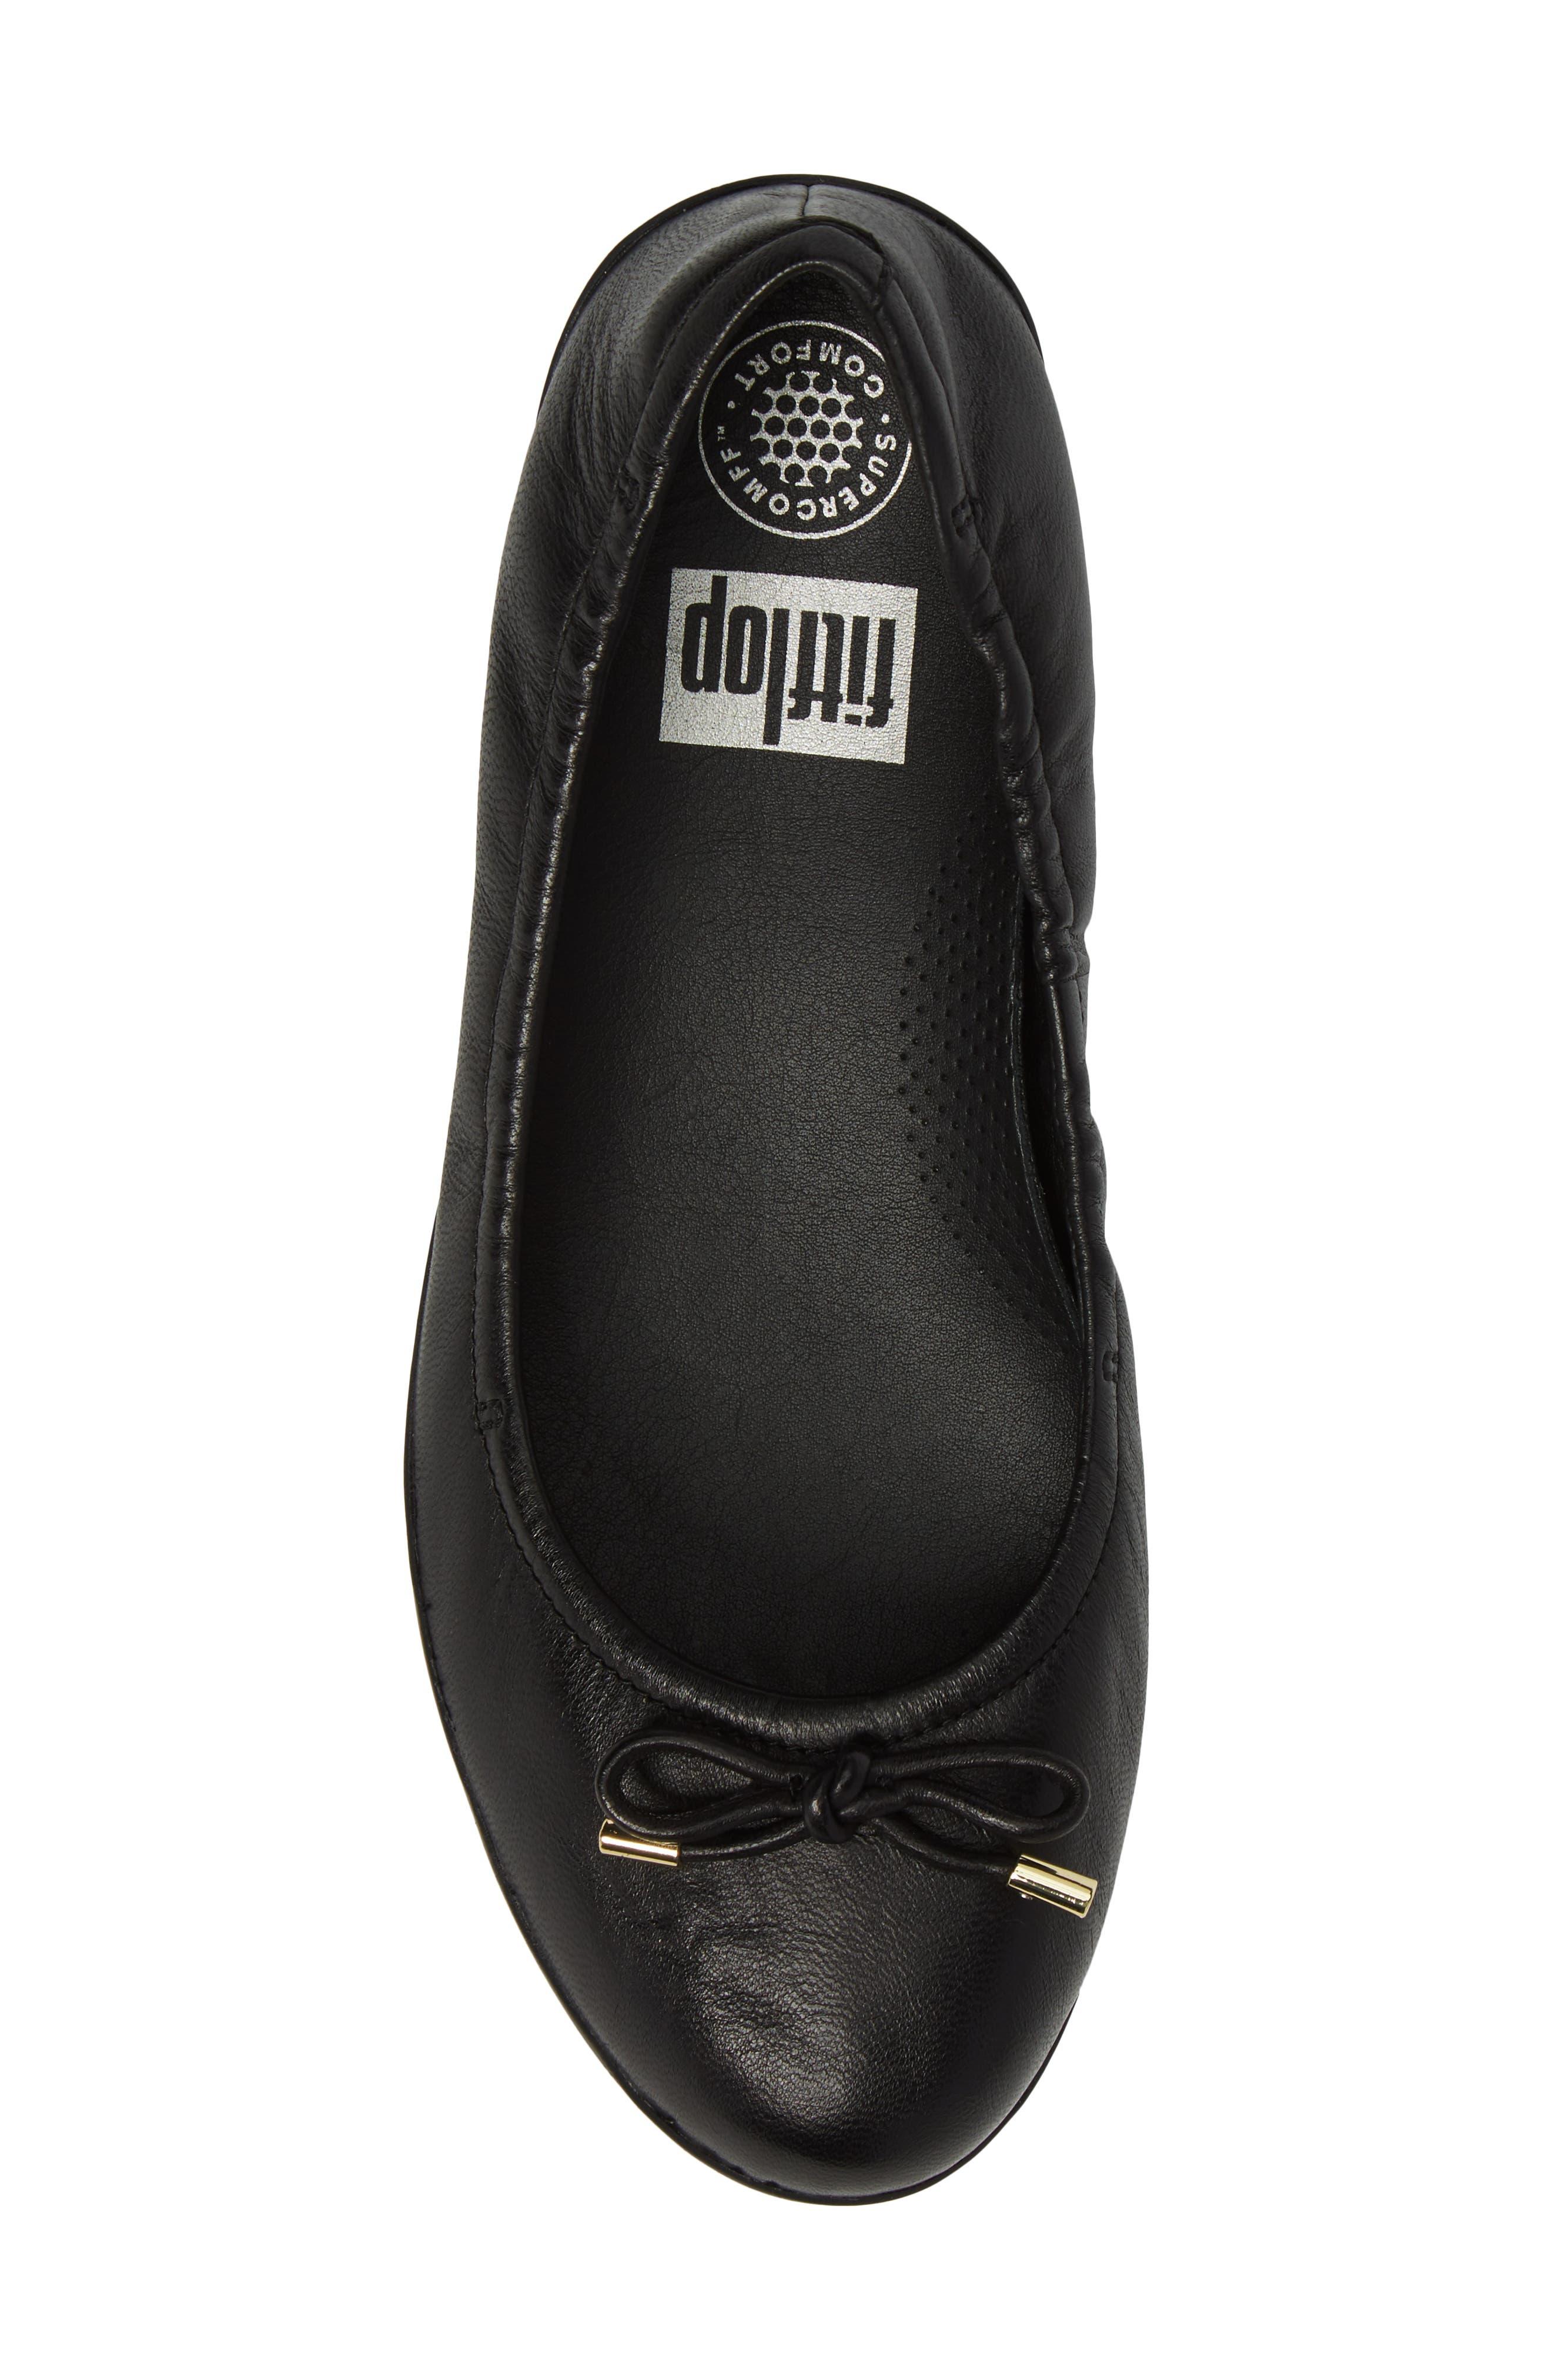 Superbendy Ballerina Flat,                             Alternate thumbnail 5, color,                             Black Leather